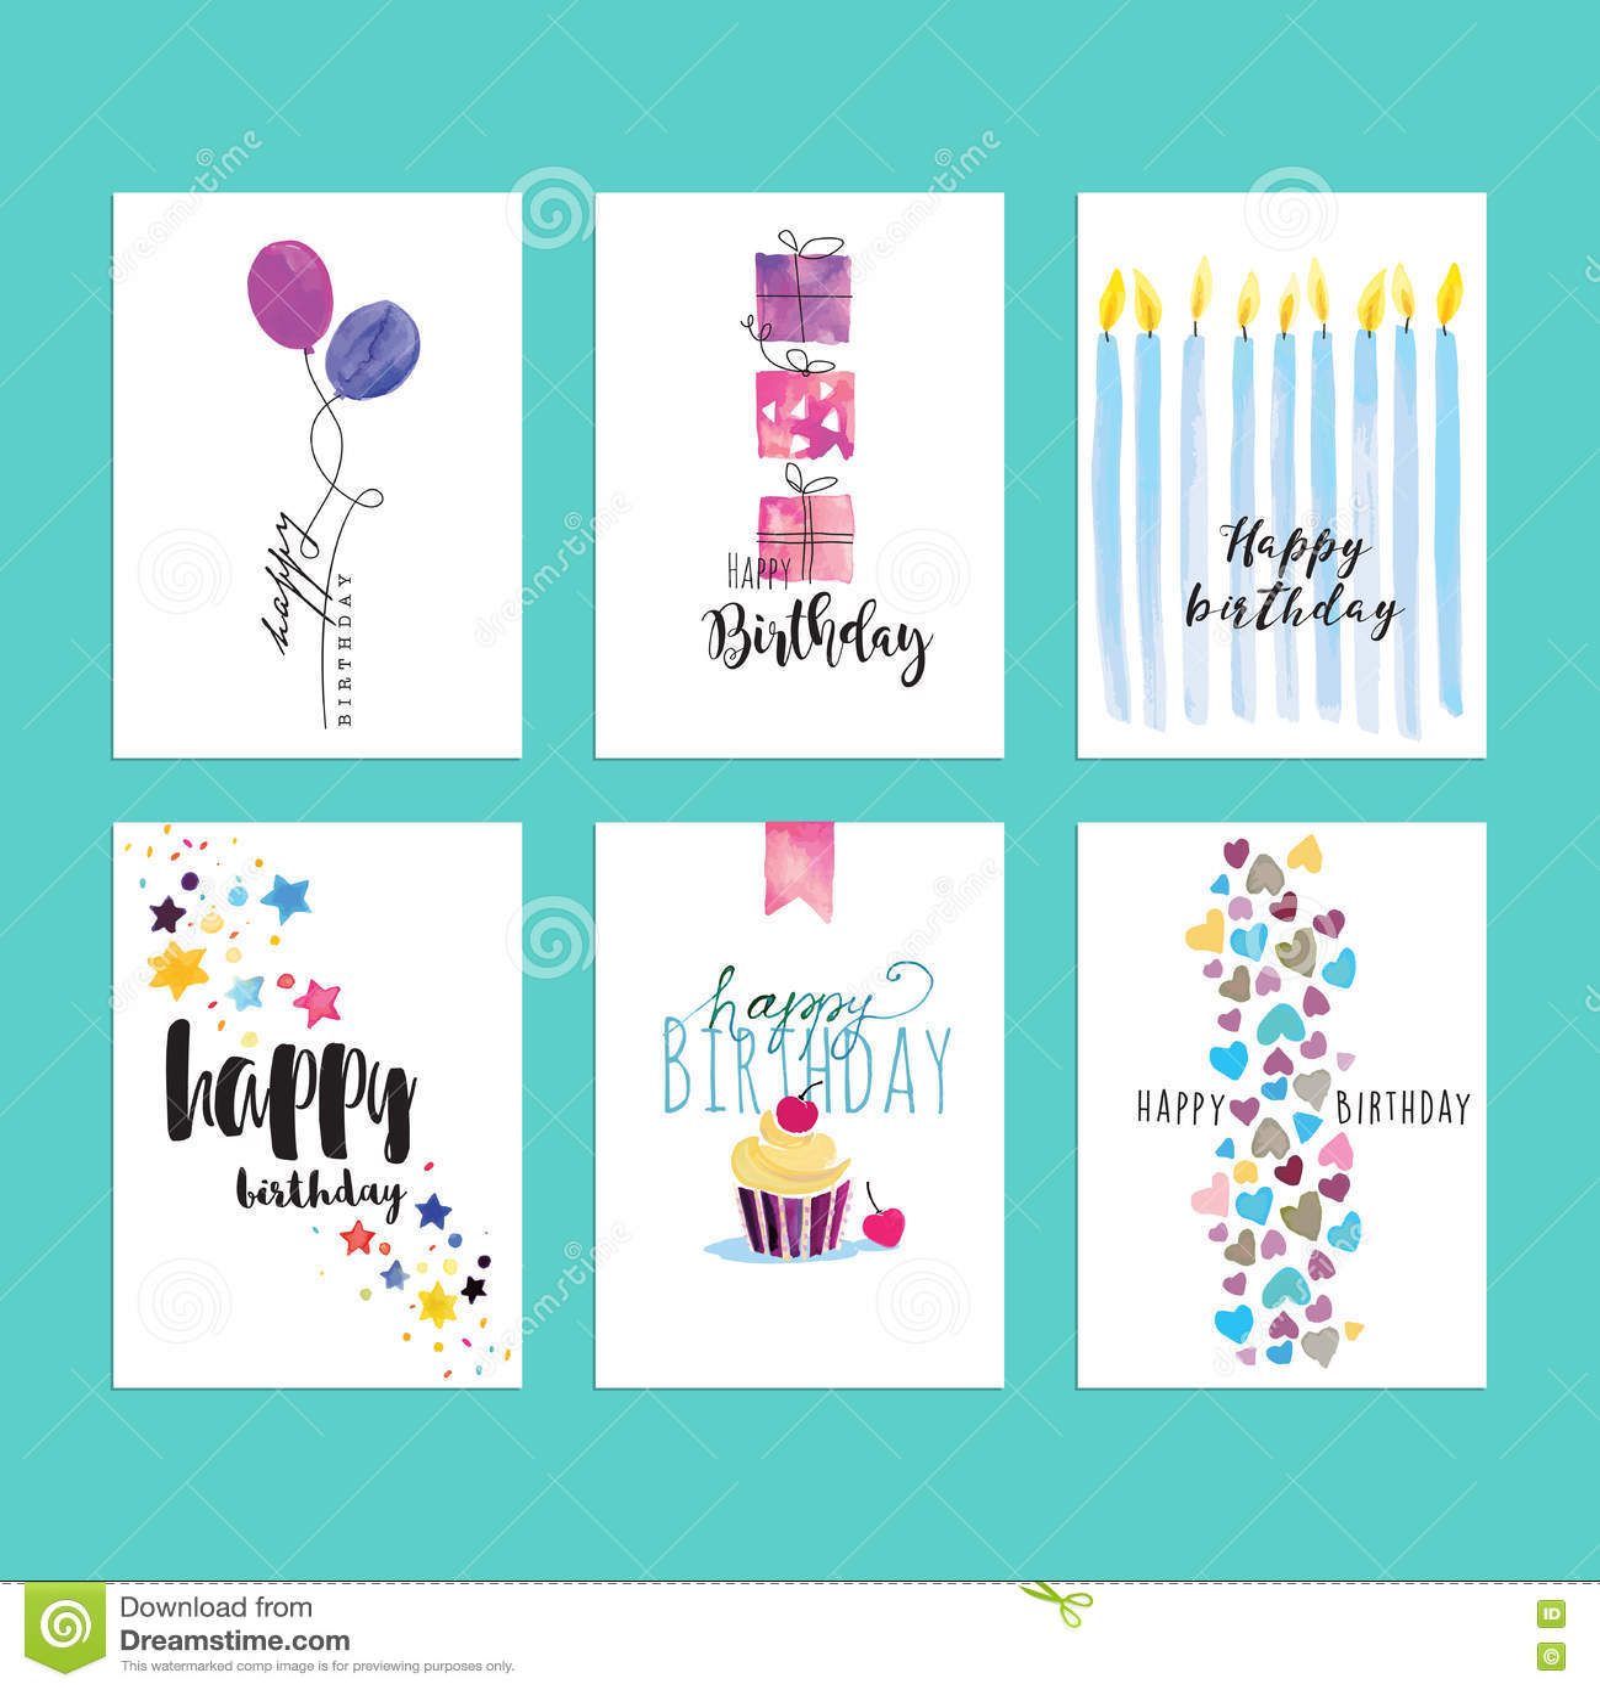 Set Of Birthday Greeting Card Templates